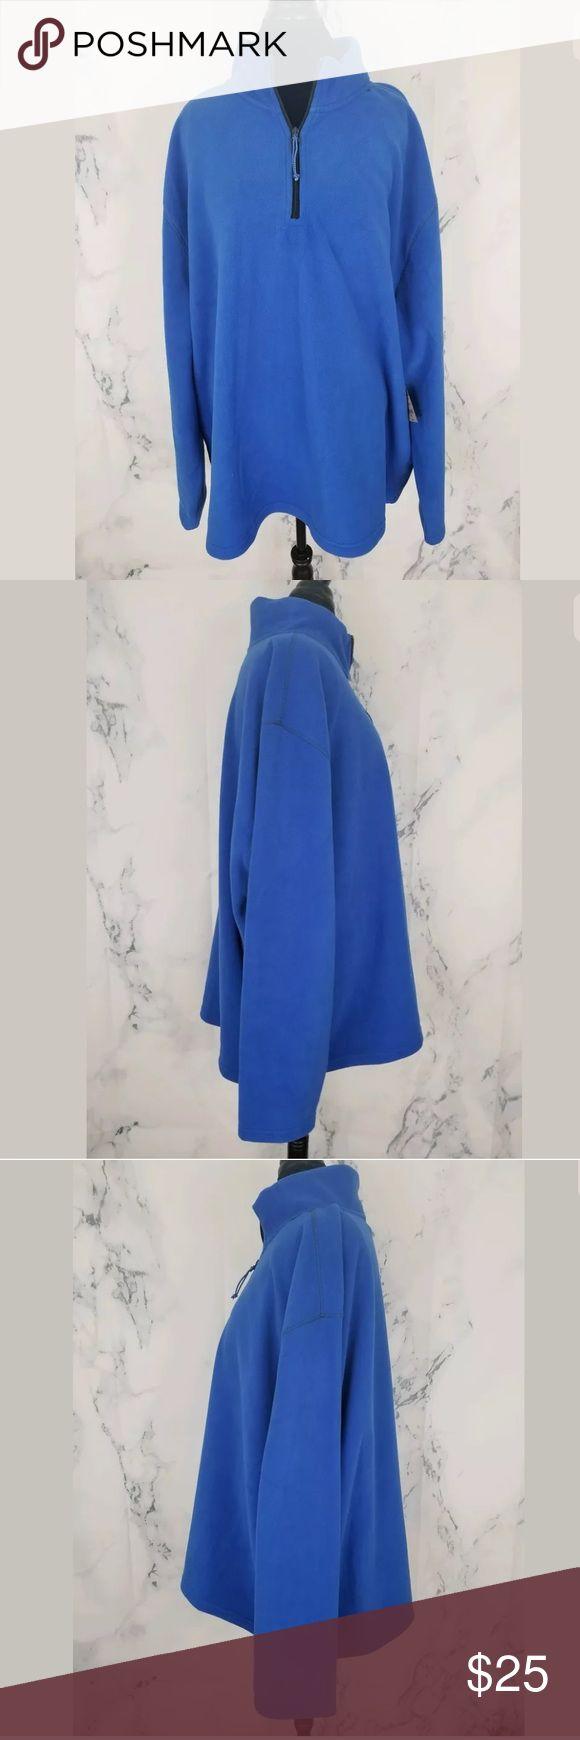 FOUNDRY BIG & TALL MENS SZ 4XL BLUE FLEECE FOUNDRY BIG & TALL MENS SZ 4XL BLUE FLEECE 1/4 ZIP FLEECE PULLOVER SWEATER NWT 100% Polyester Foundry Jackets & Coats